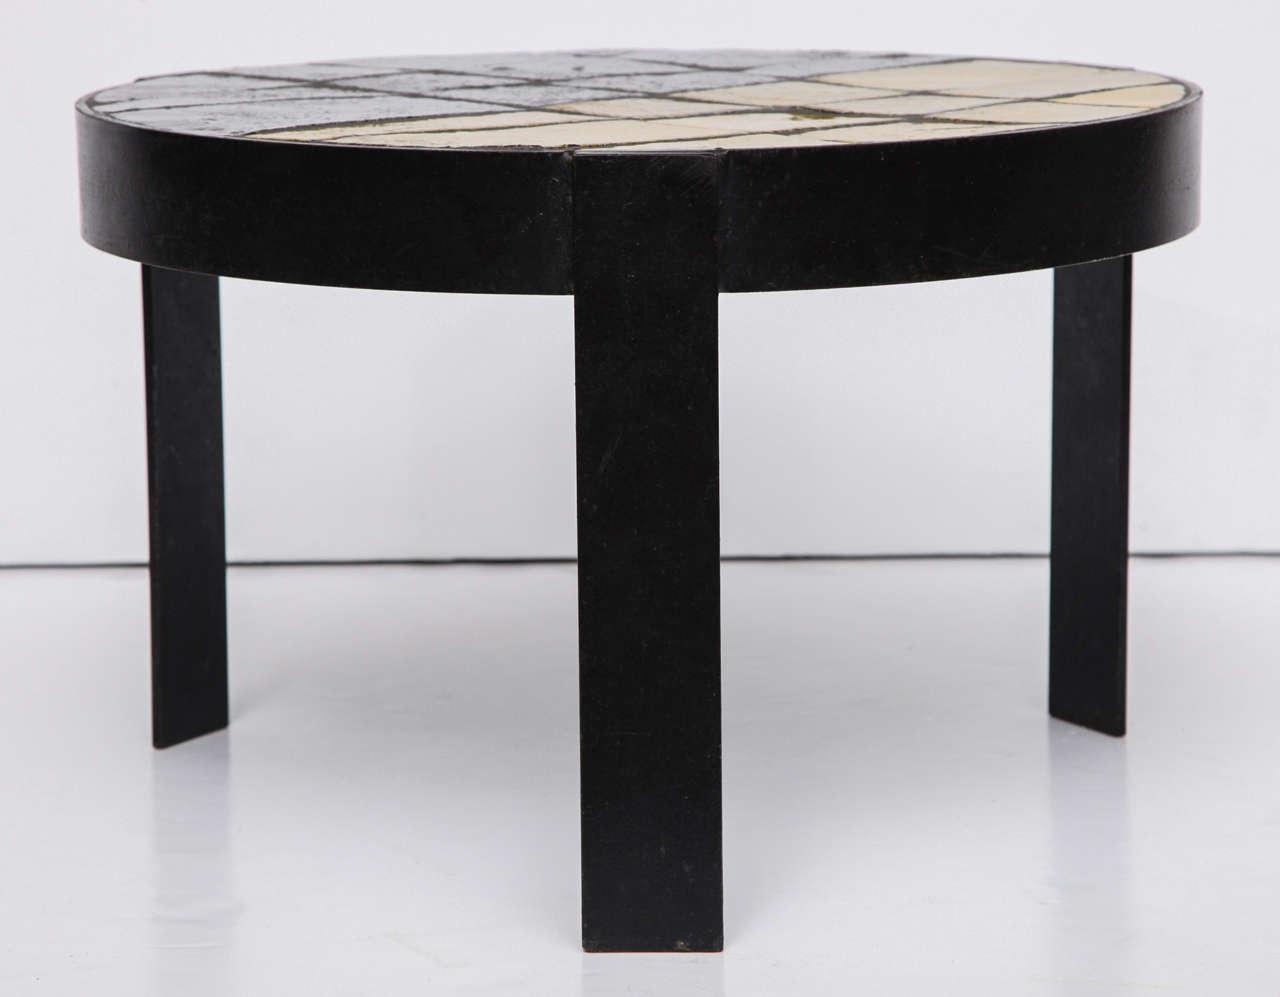 Steel Unusual Ceramic Tile Top Table For Sale